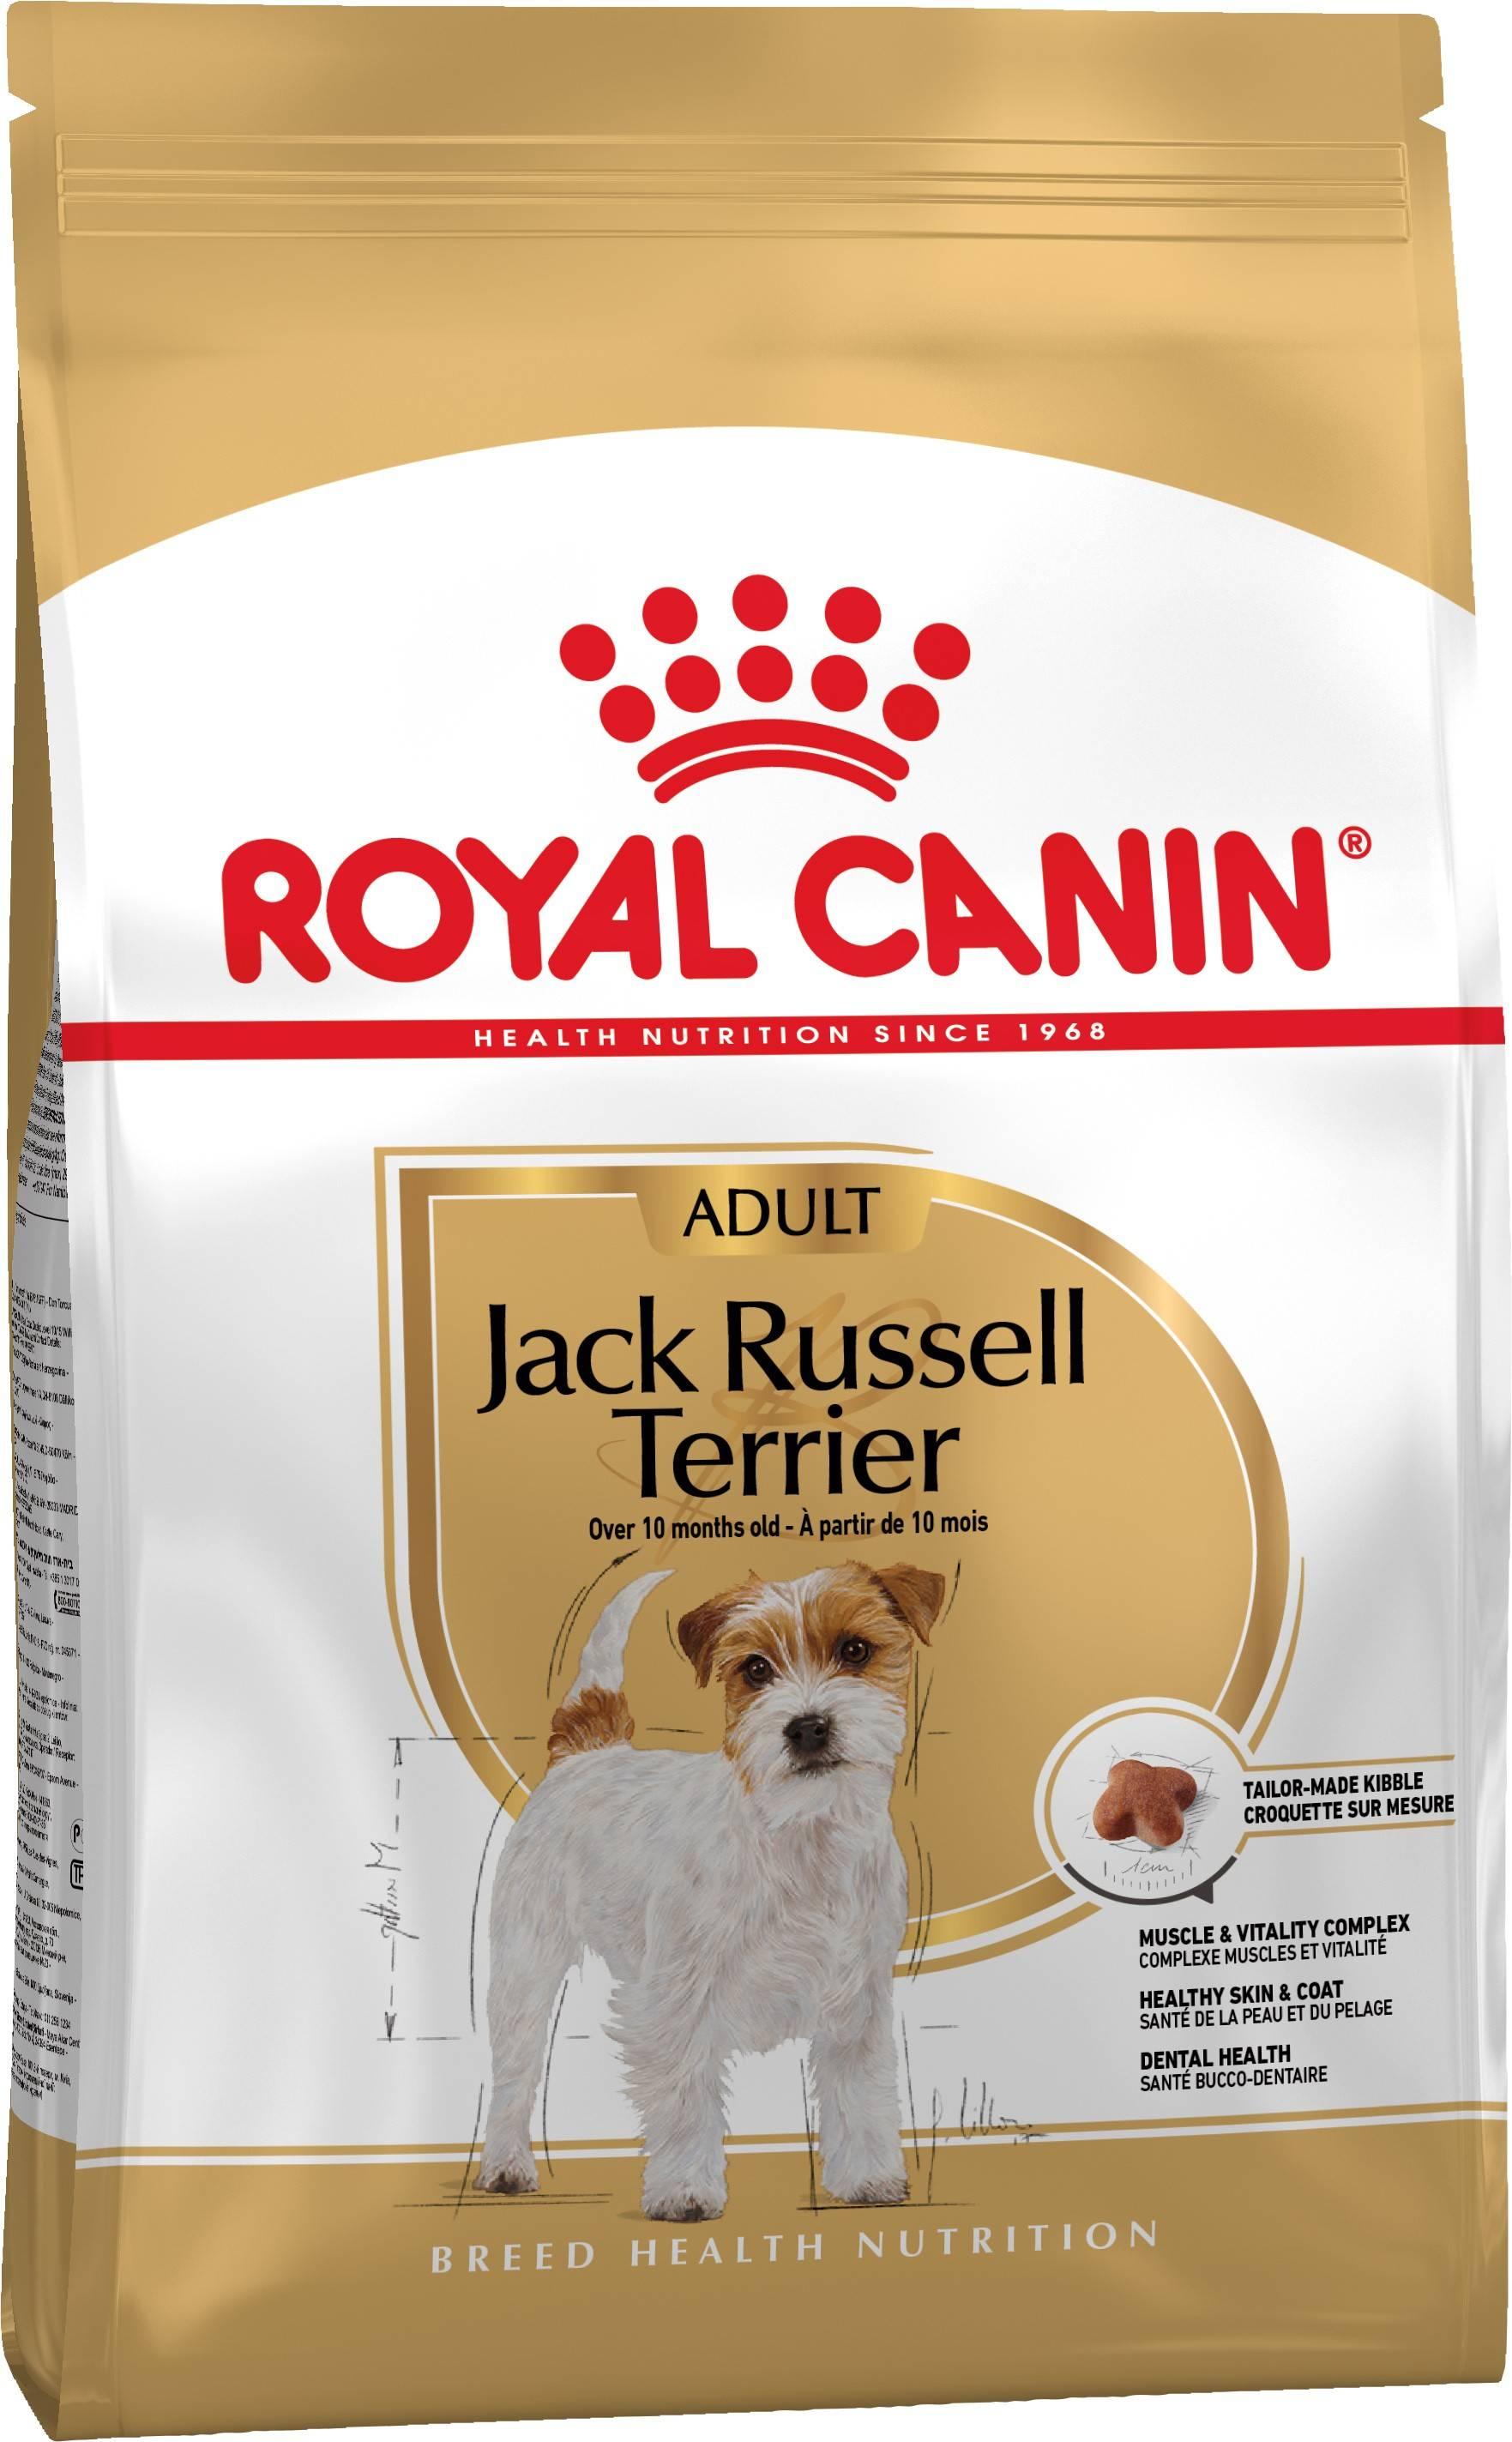 ROYAL CANIN JACK RUSSELL TERRIER ADULT – сухой корм для взрослых собак породы джек-рассел-терьер